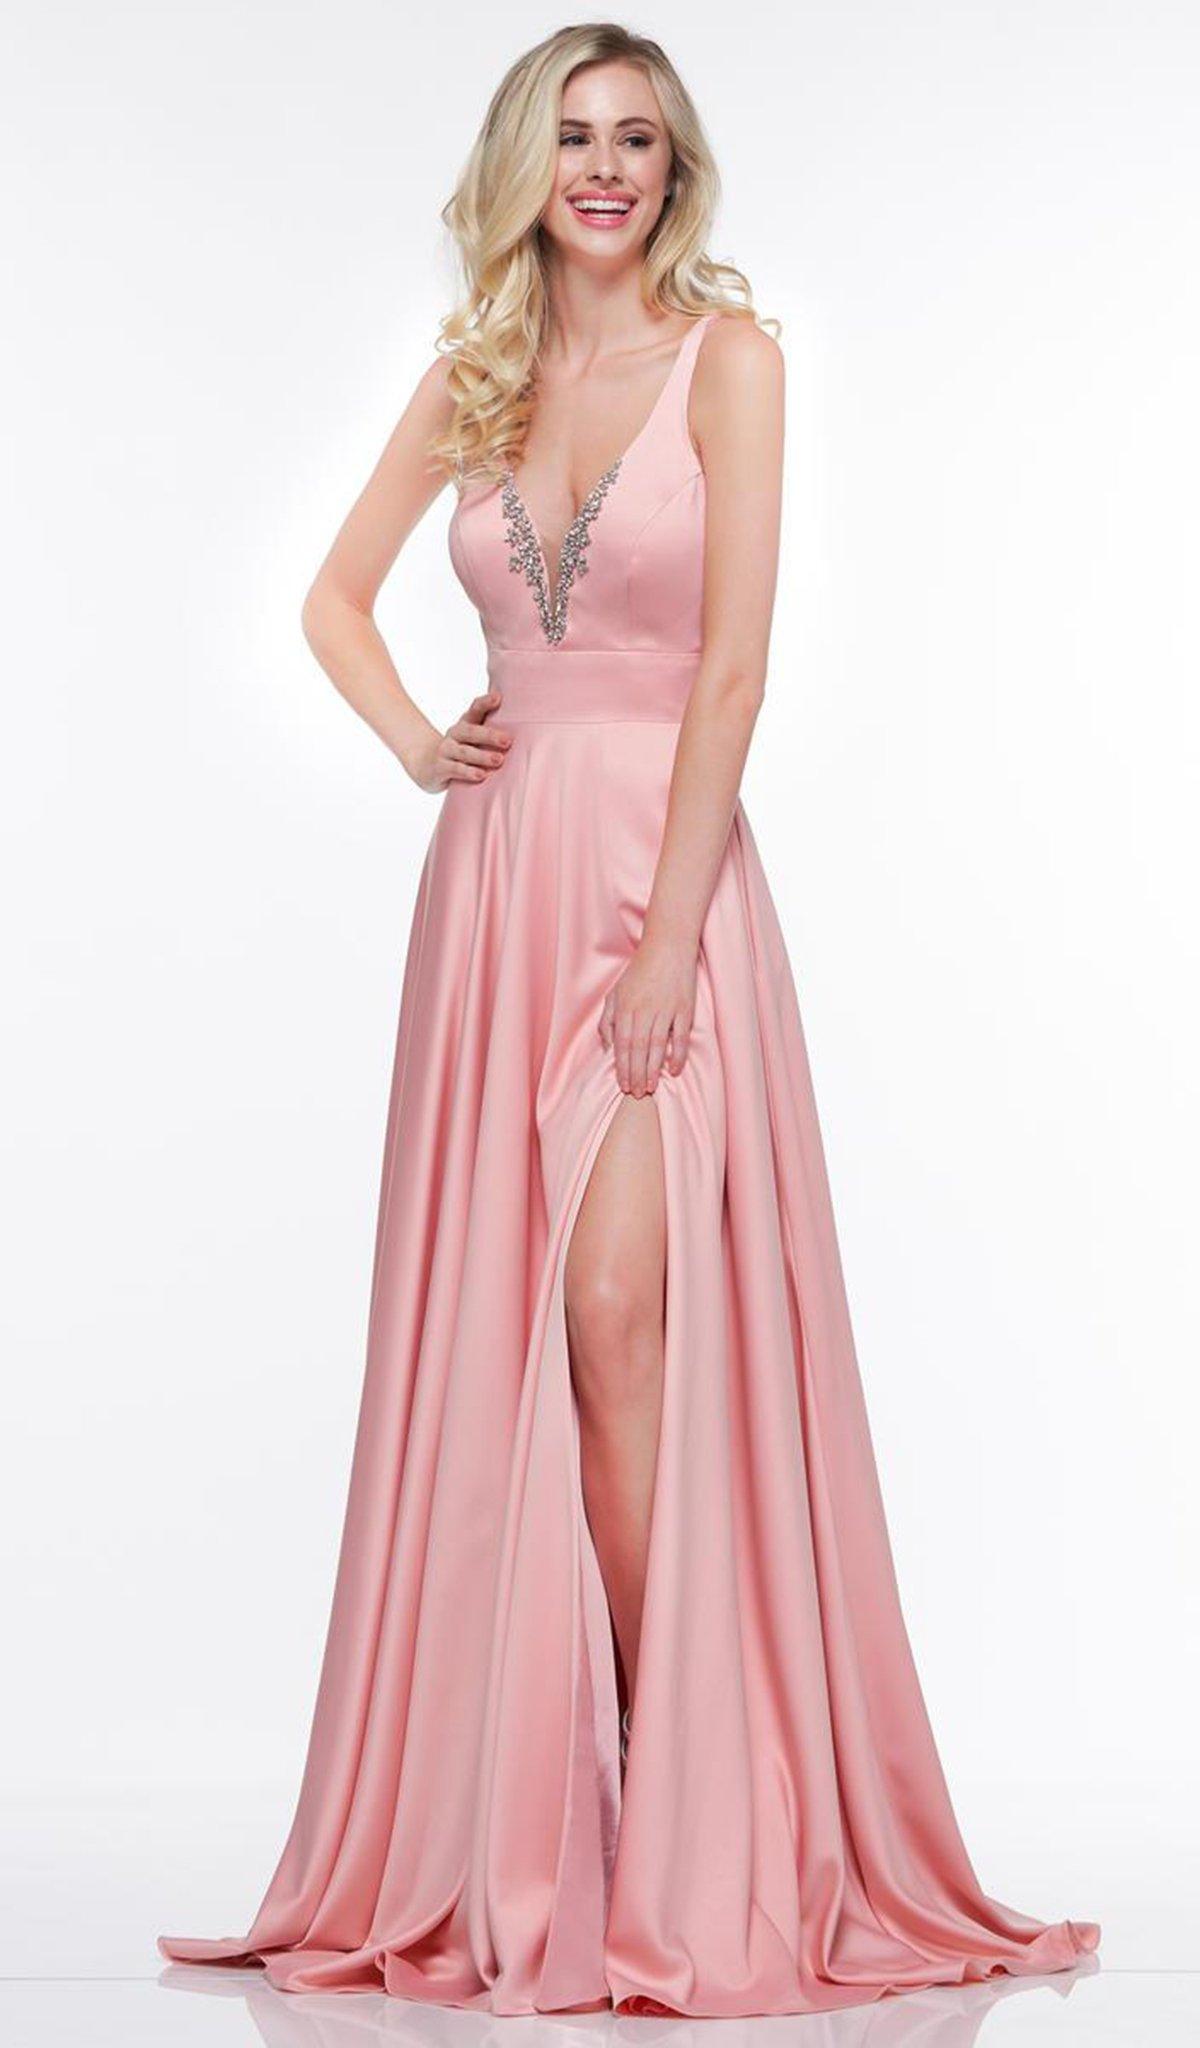 Glow by Colors - G813 Embellished Deep V-neck A-line Dress